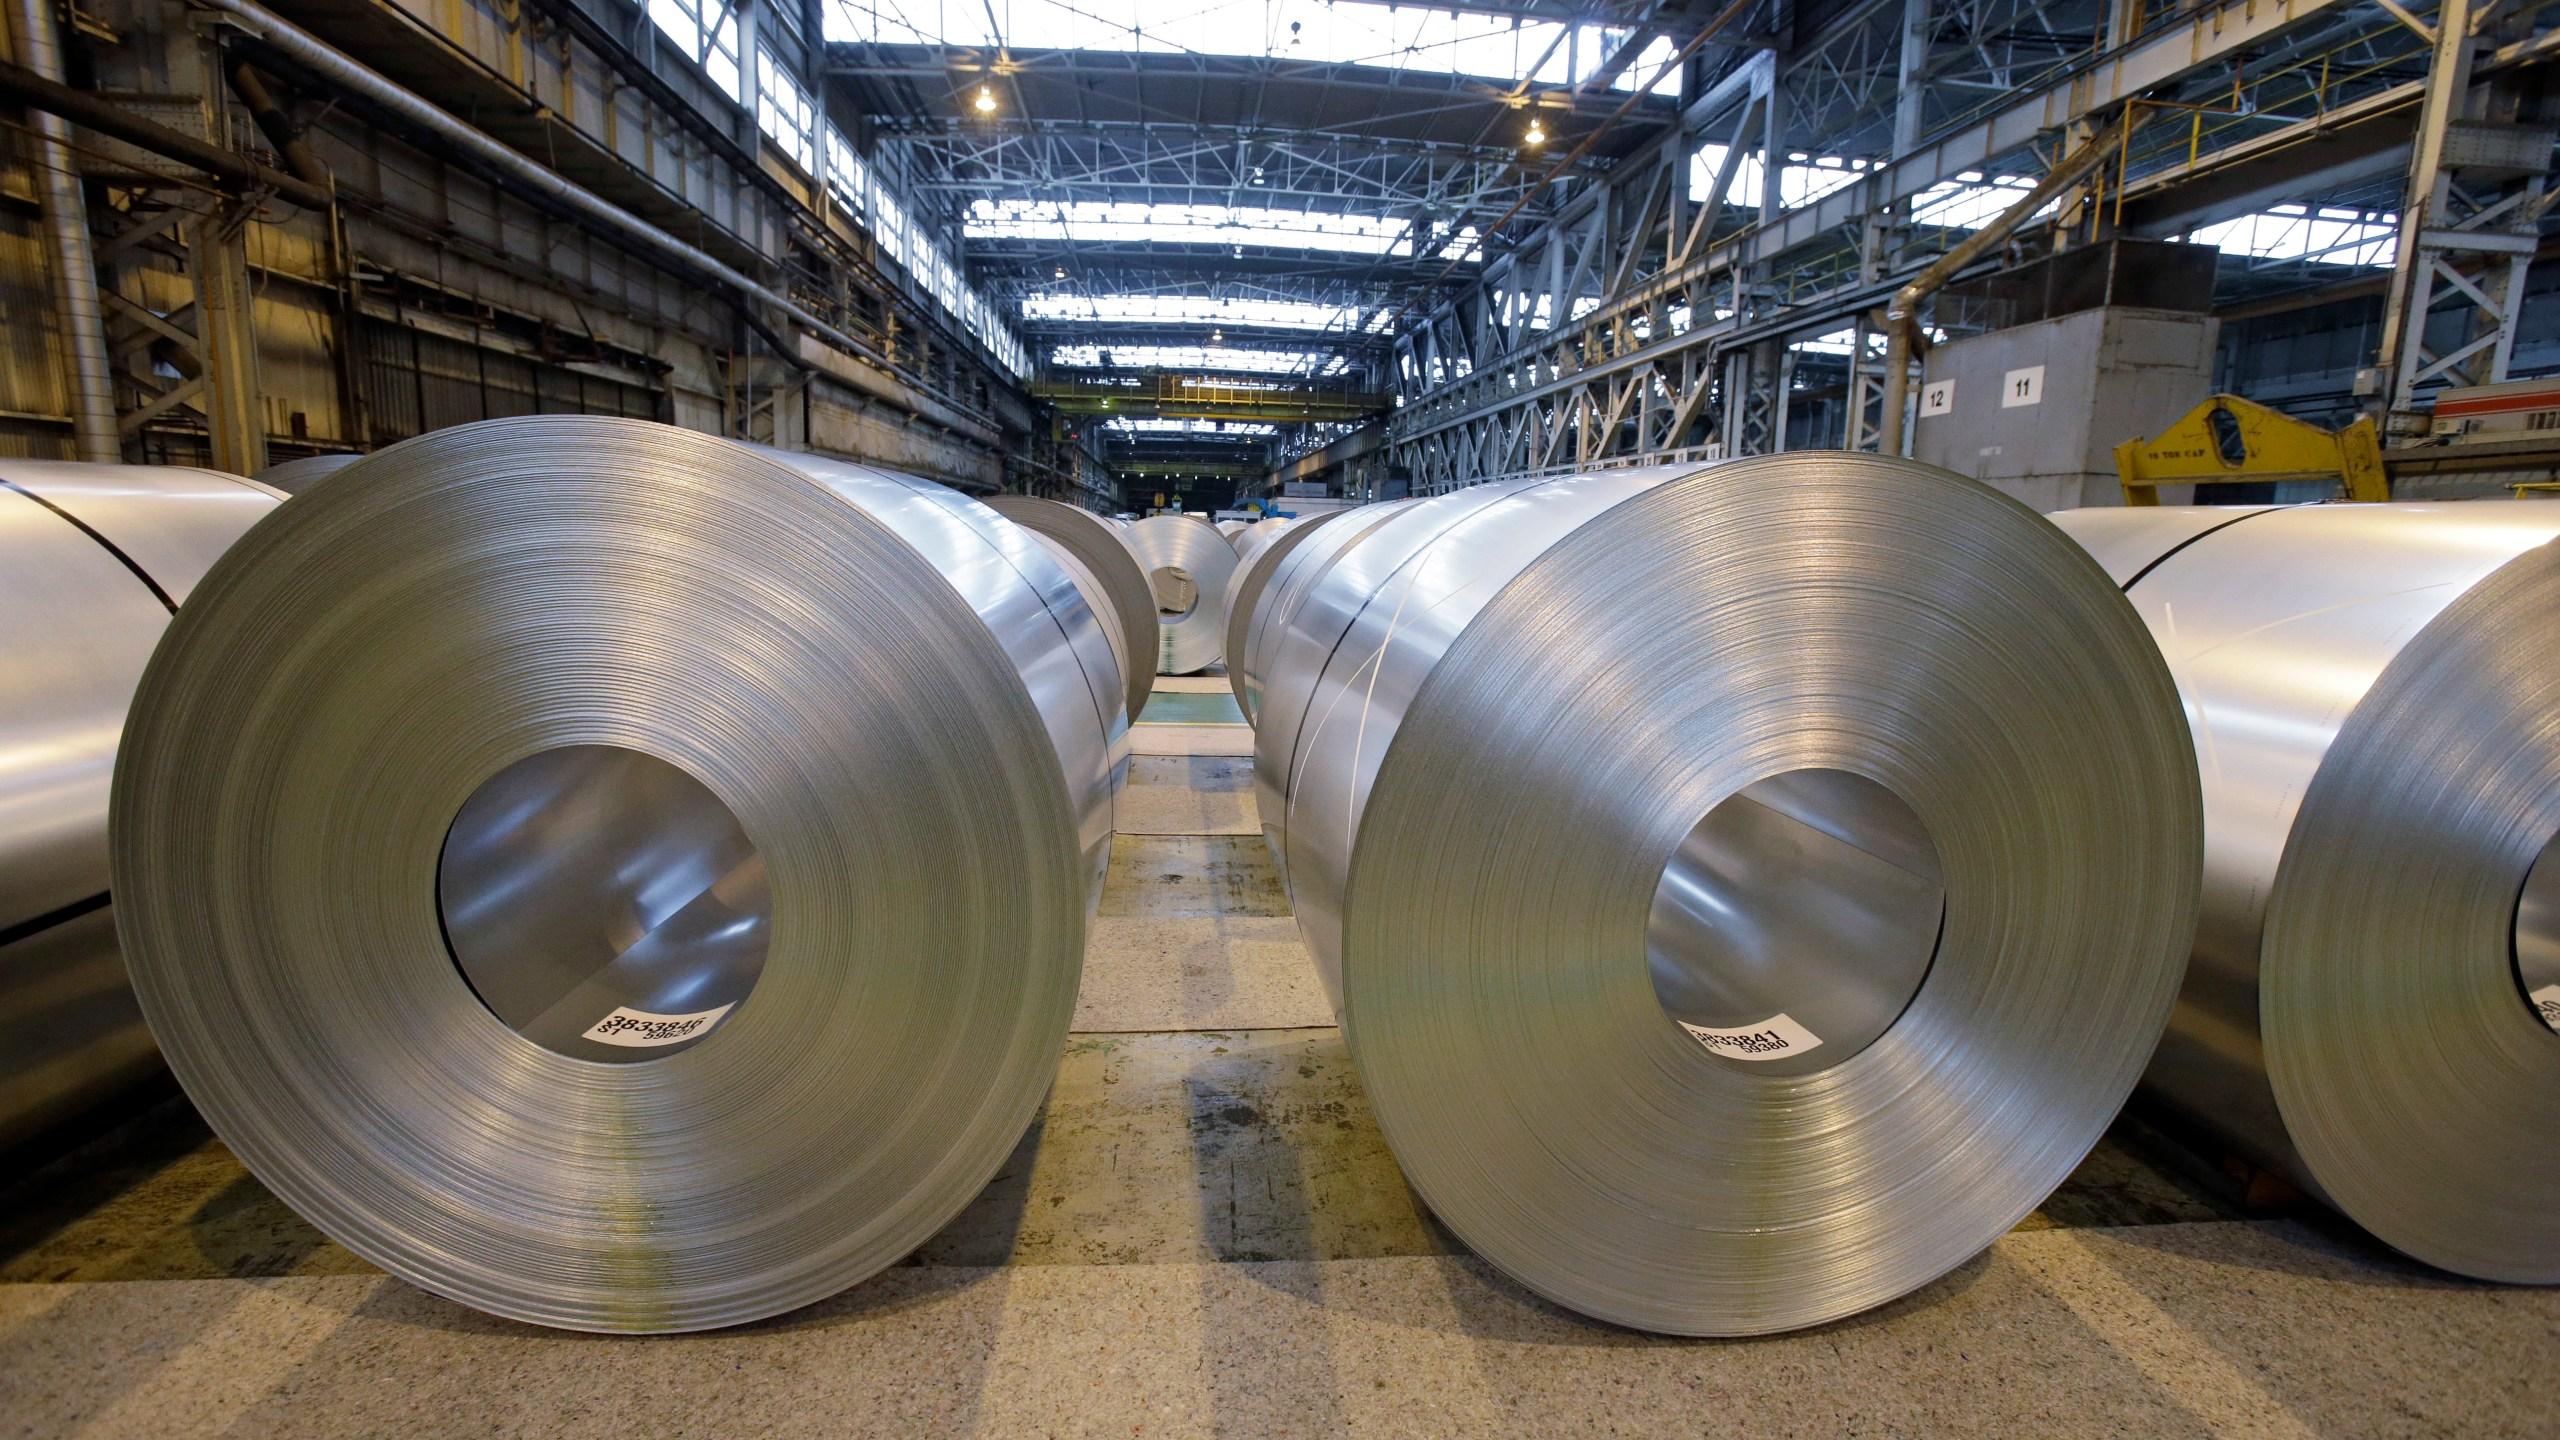 Tariffs_Steel_Industry_79056-159532.jpg52793874